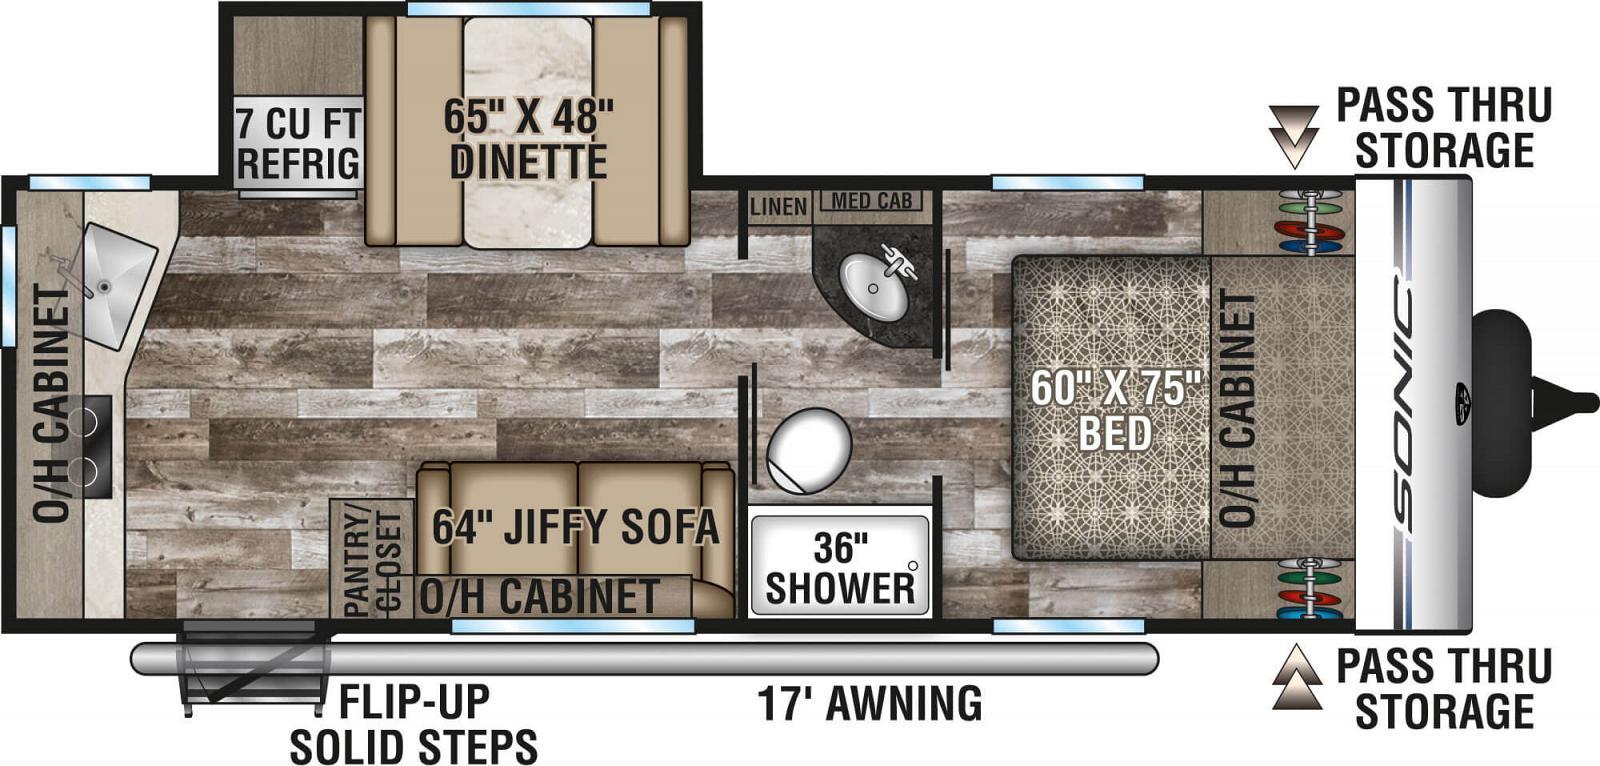 2020 VENTURE SONIC 231VRK (couples) Floorplan